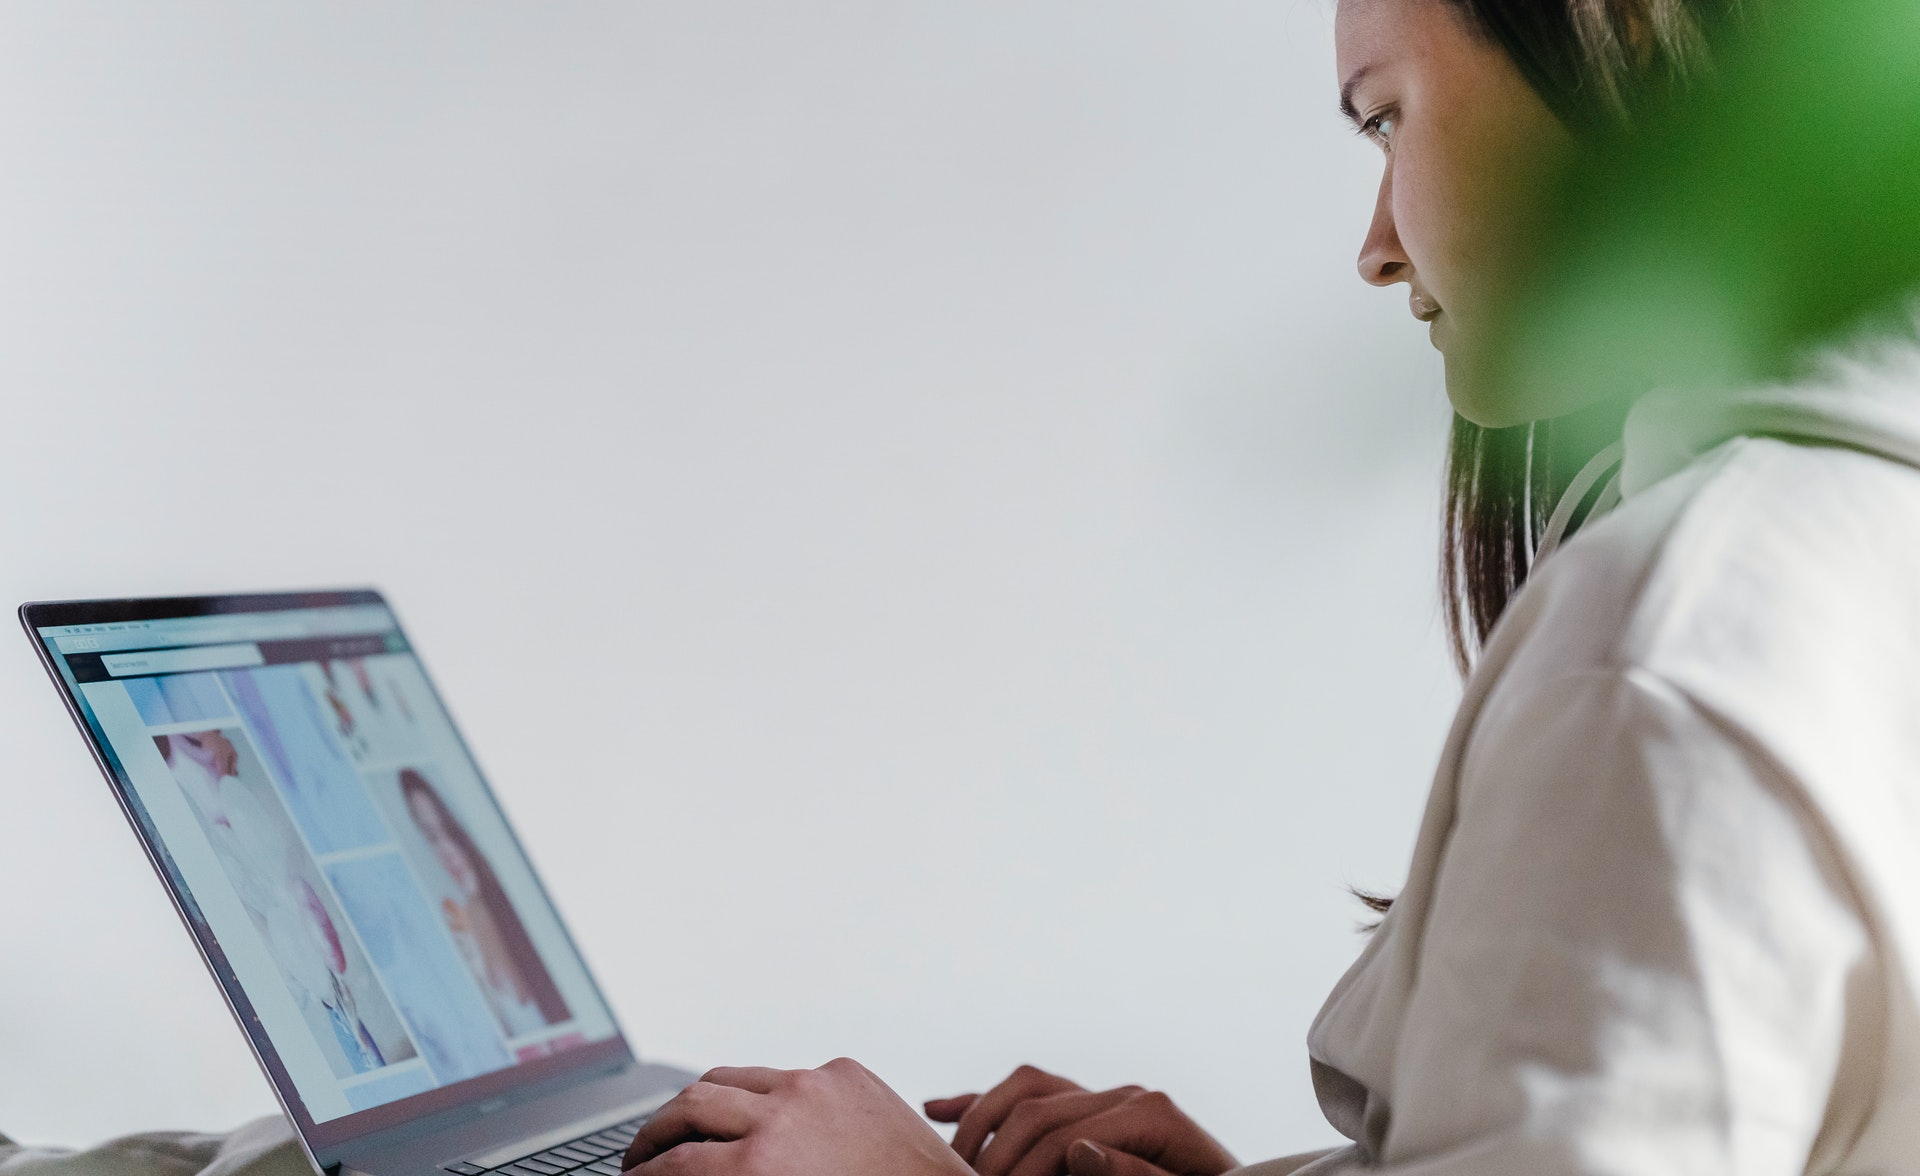 ciberseguridad-asignatura-pendiente-empresas